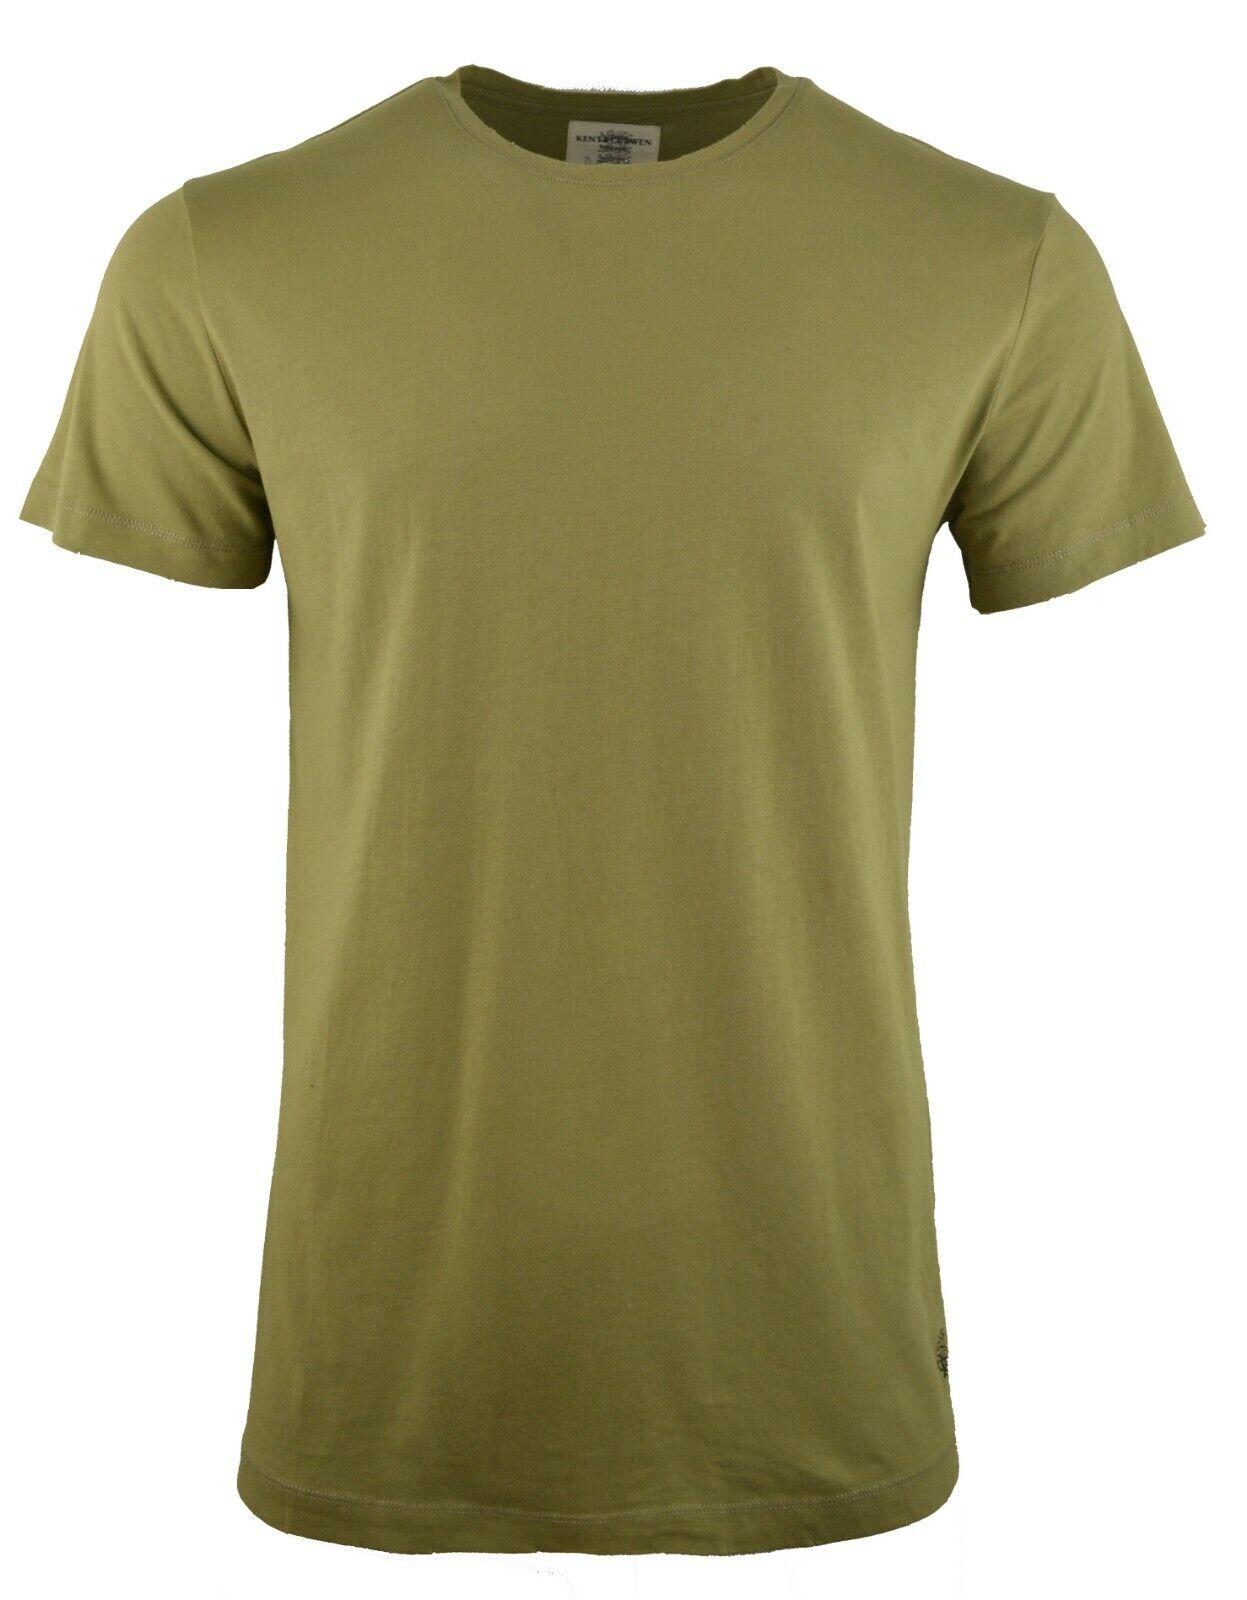 Kent & Curwen Lavaggio Vintage T-Shirt verde Oliva rosa Logo Girocollo David Beckham